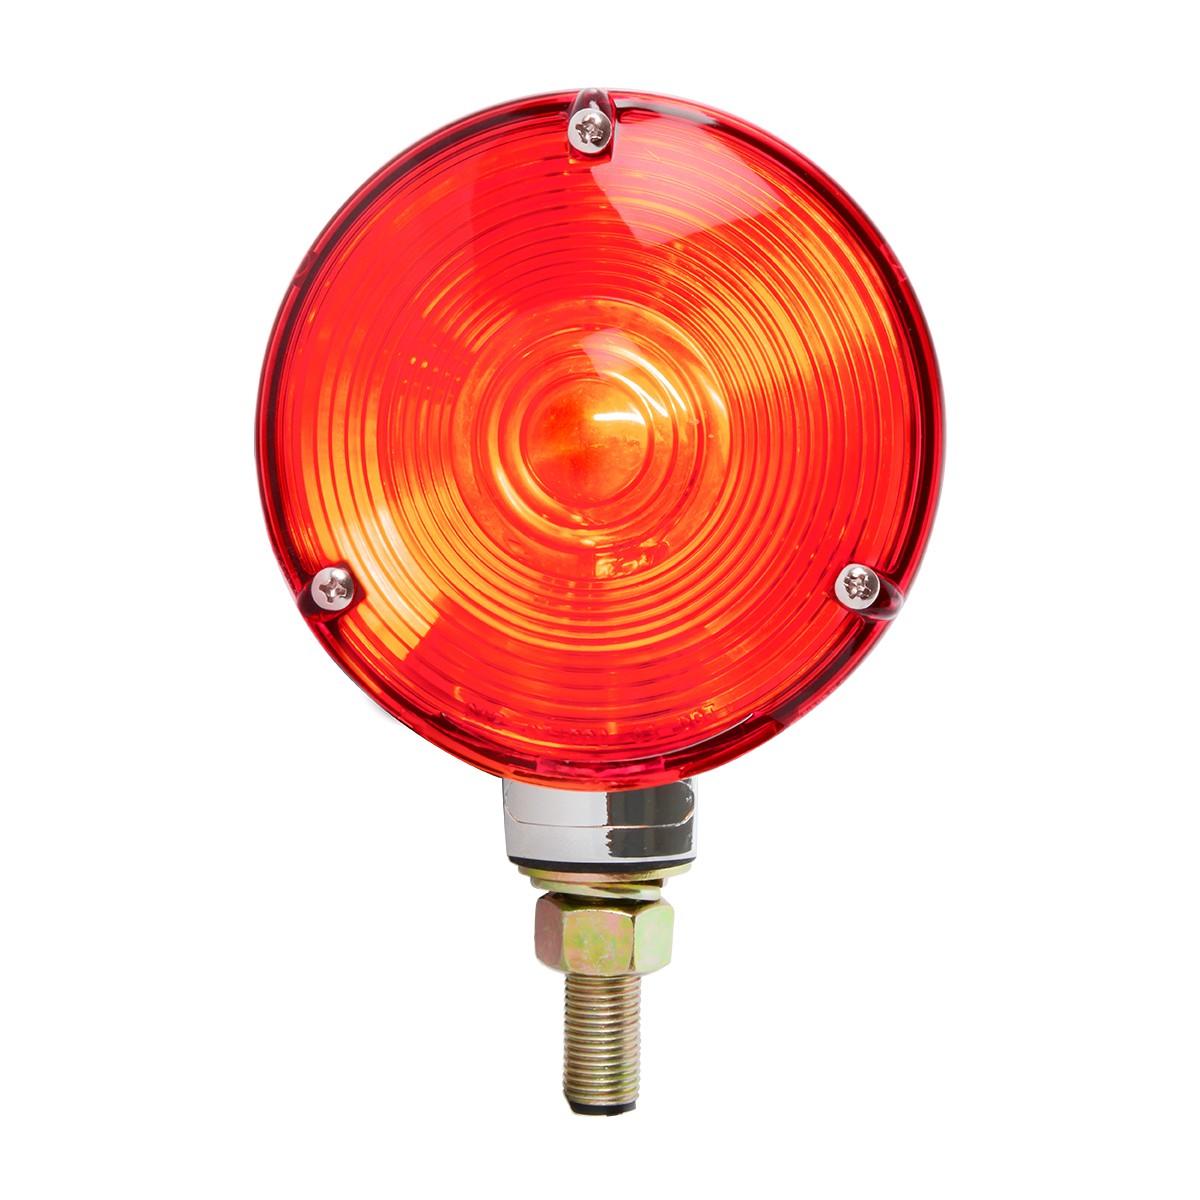 "#80500 4"" Single Face Pedestal Red Light"